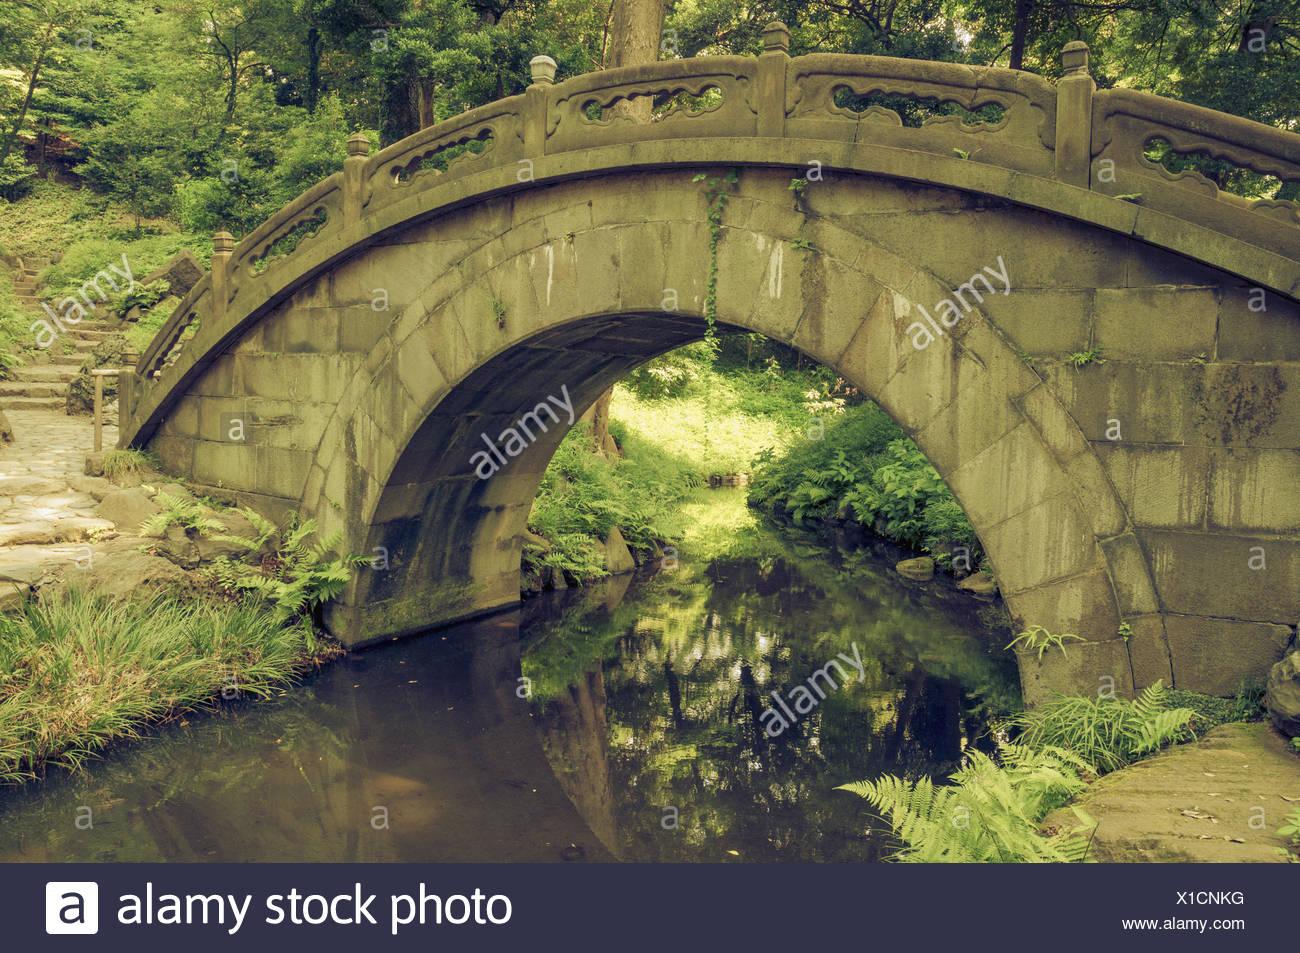 humpbacked bridge - Stock Image